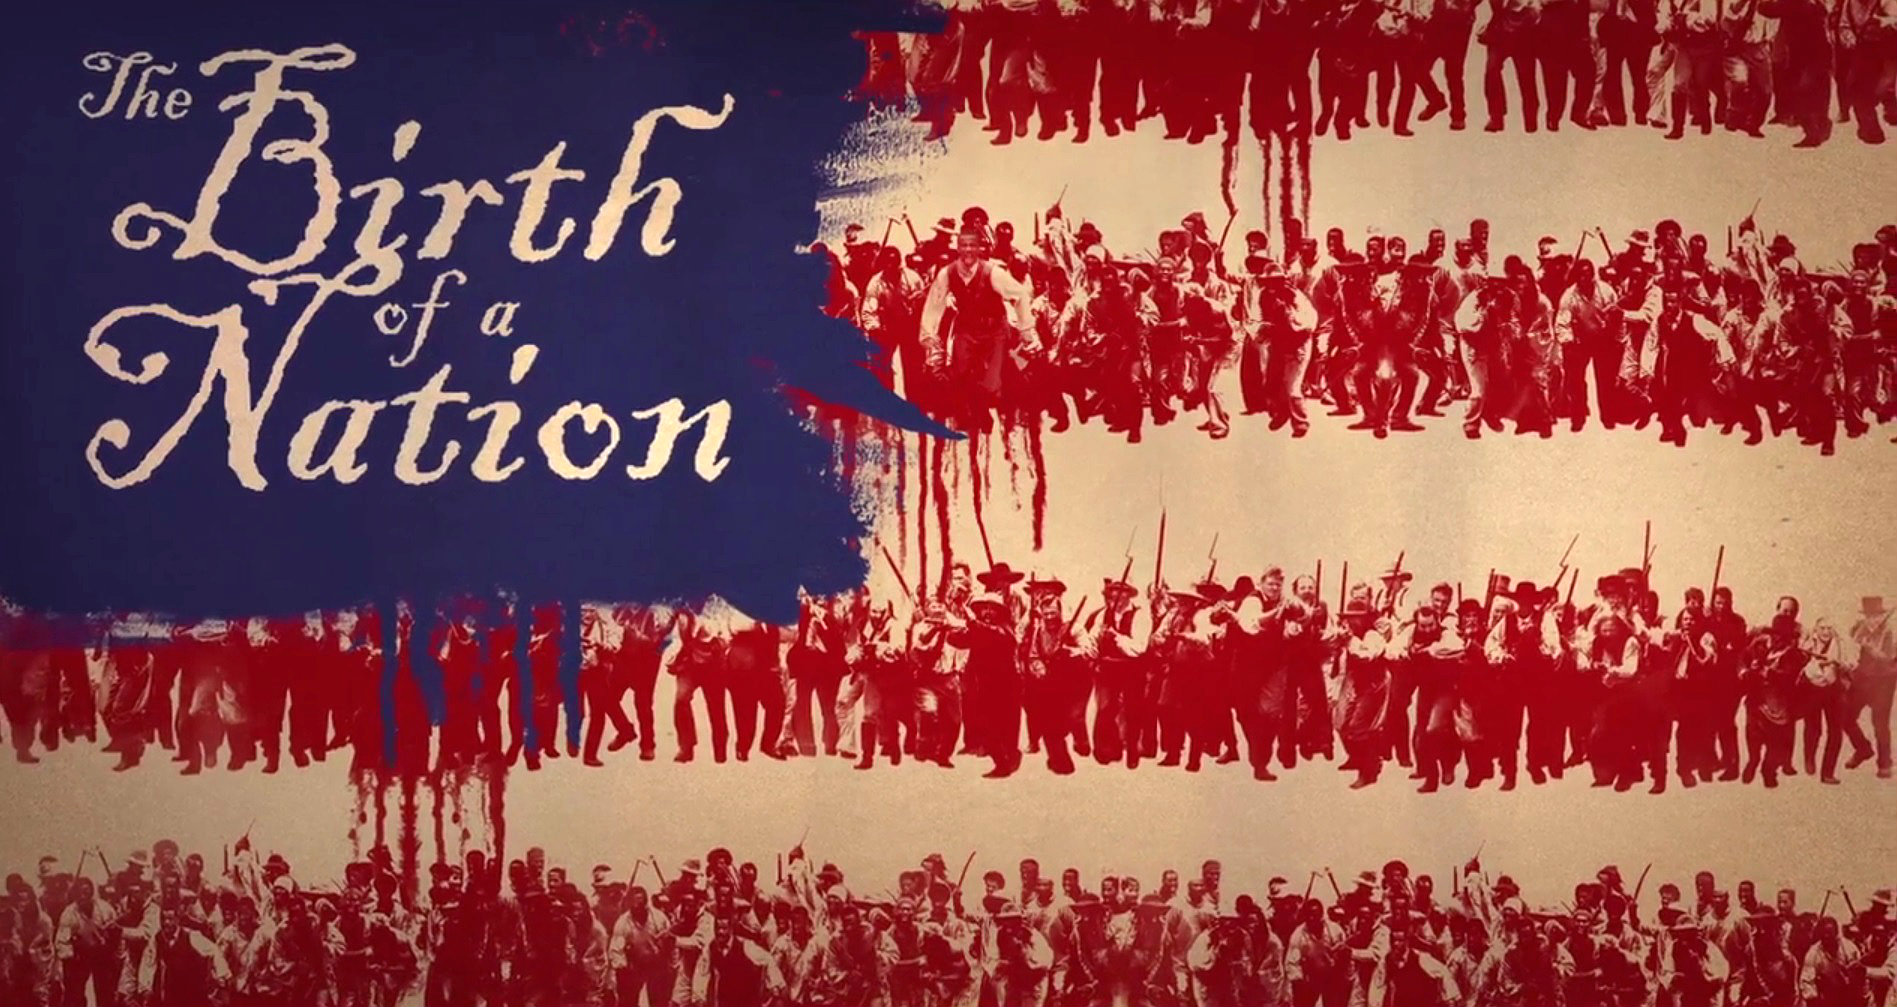 The Birth of a Nation, une puissante leçon d'histoire